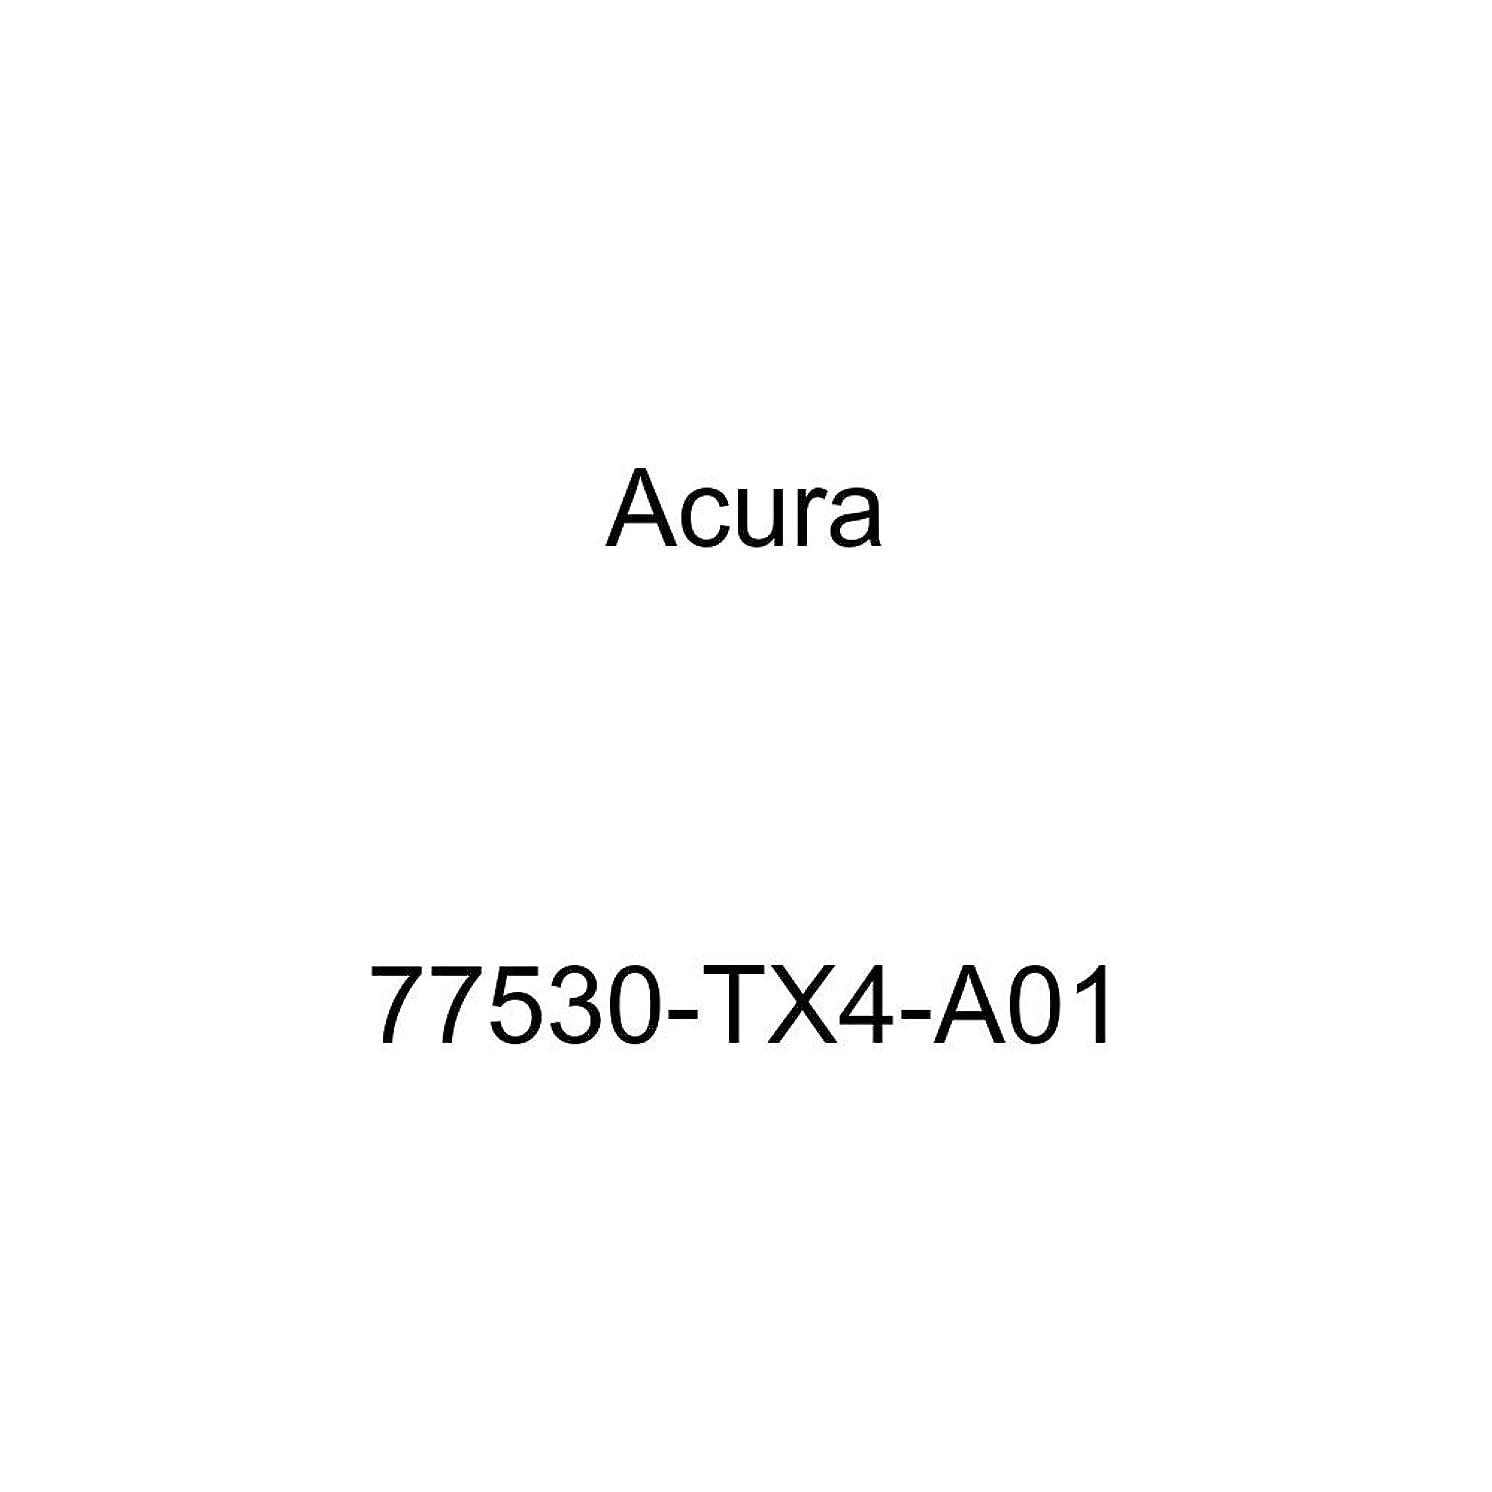 Acura 77530-TX4-A01 Glove Box Support